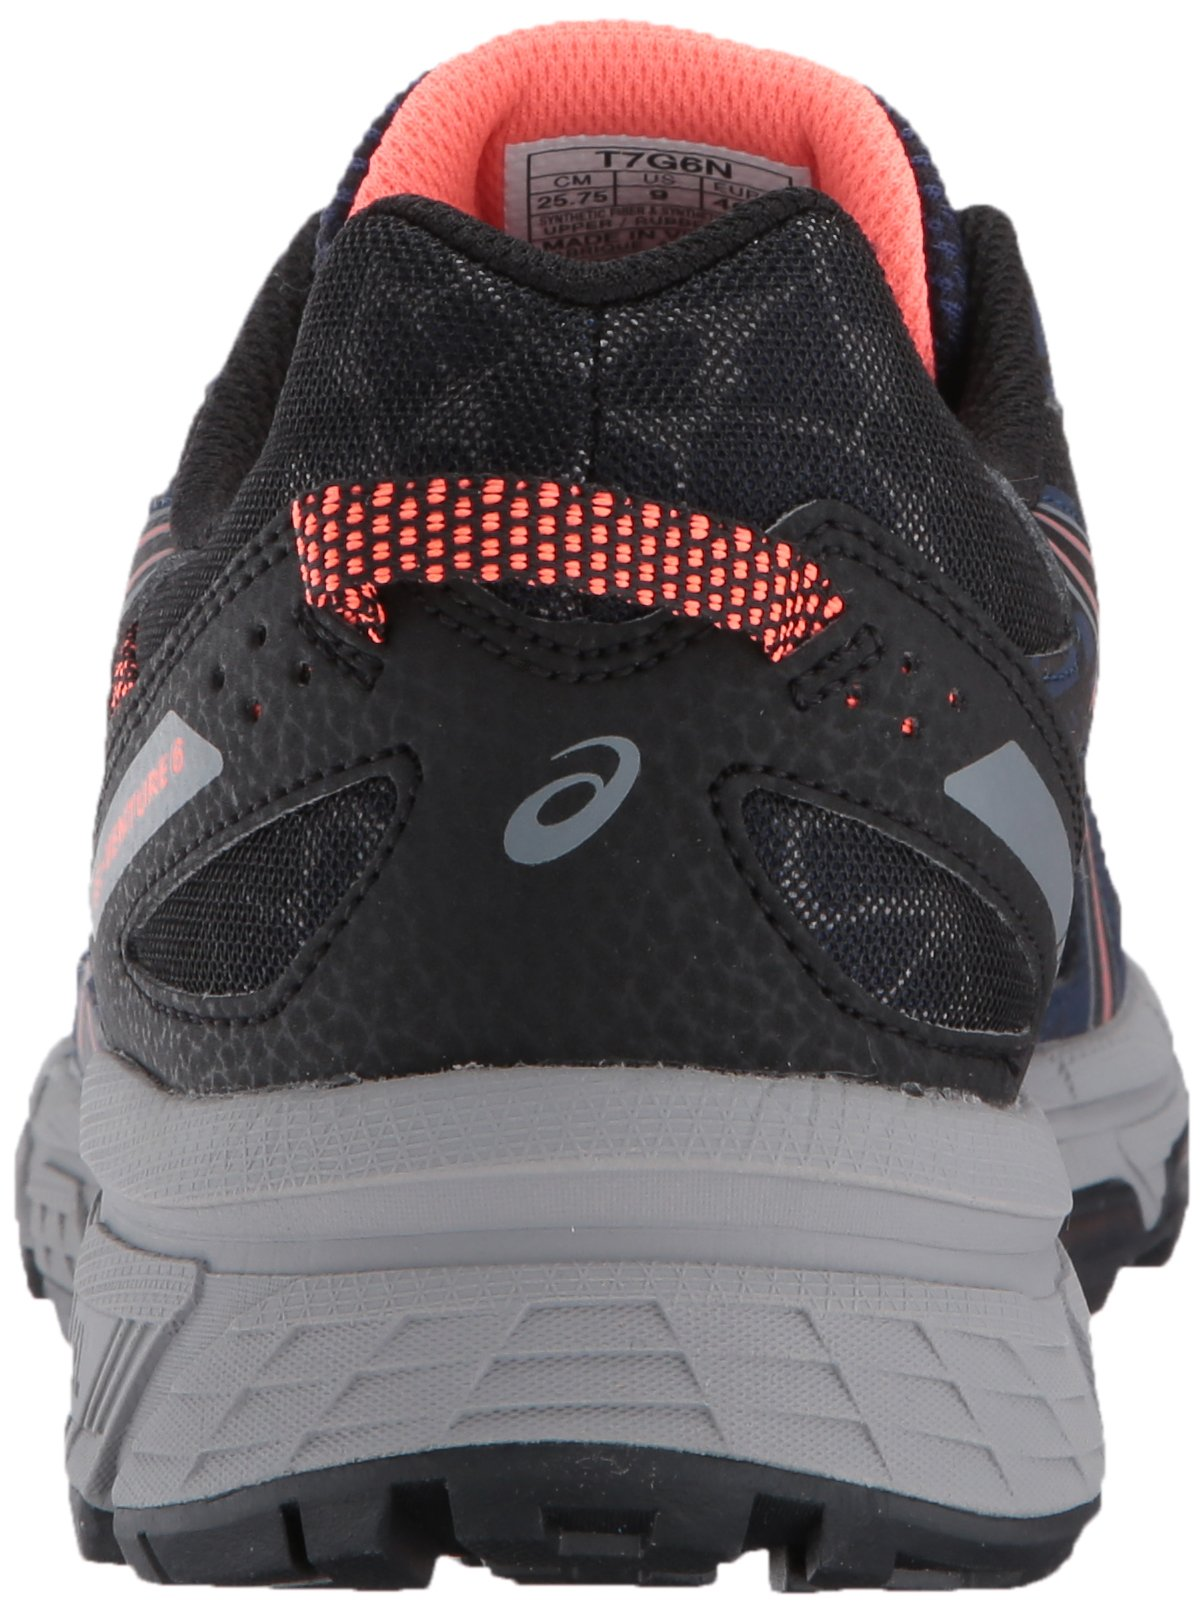 ASICS Women's Gel-Venture 6 Running-Shoes,Indigo Blue/Black/Coral,5 Medium US by ASICS (Image #2)